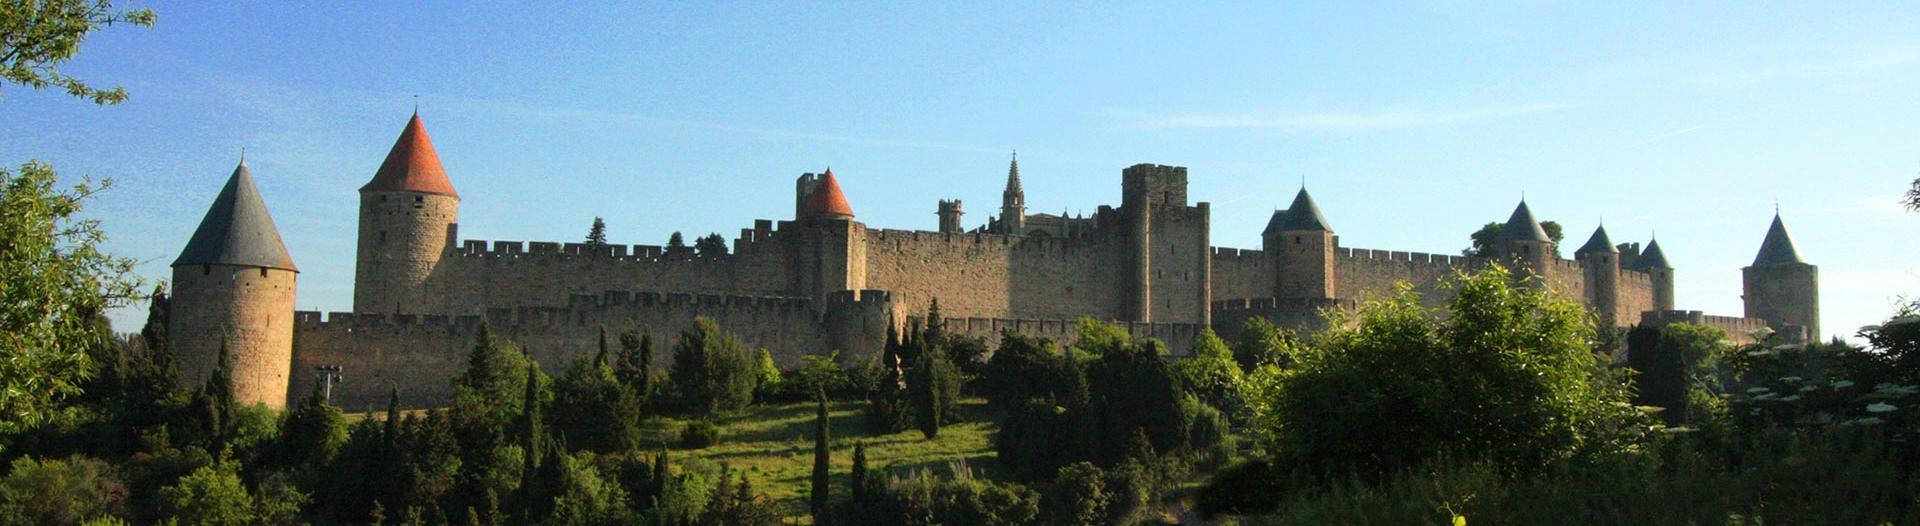 slider-carcassonne-aude